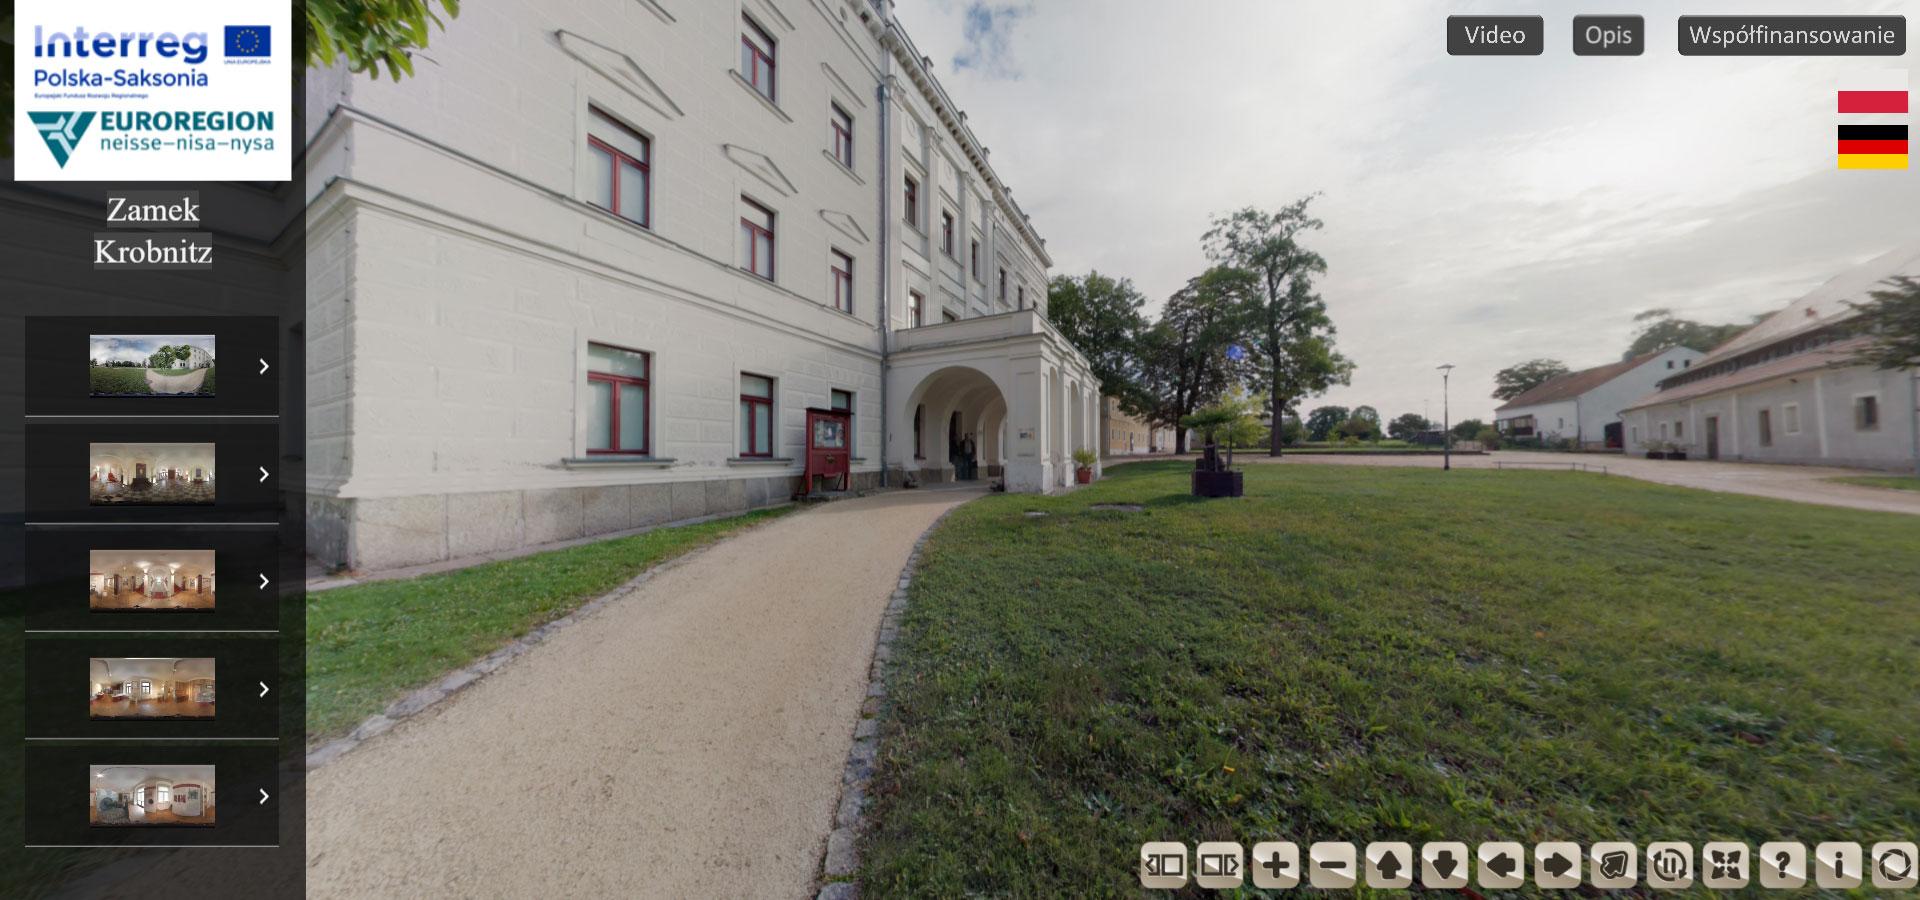 Zamek-Krobintz-link